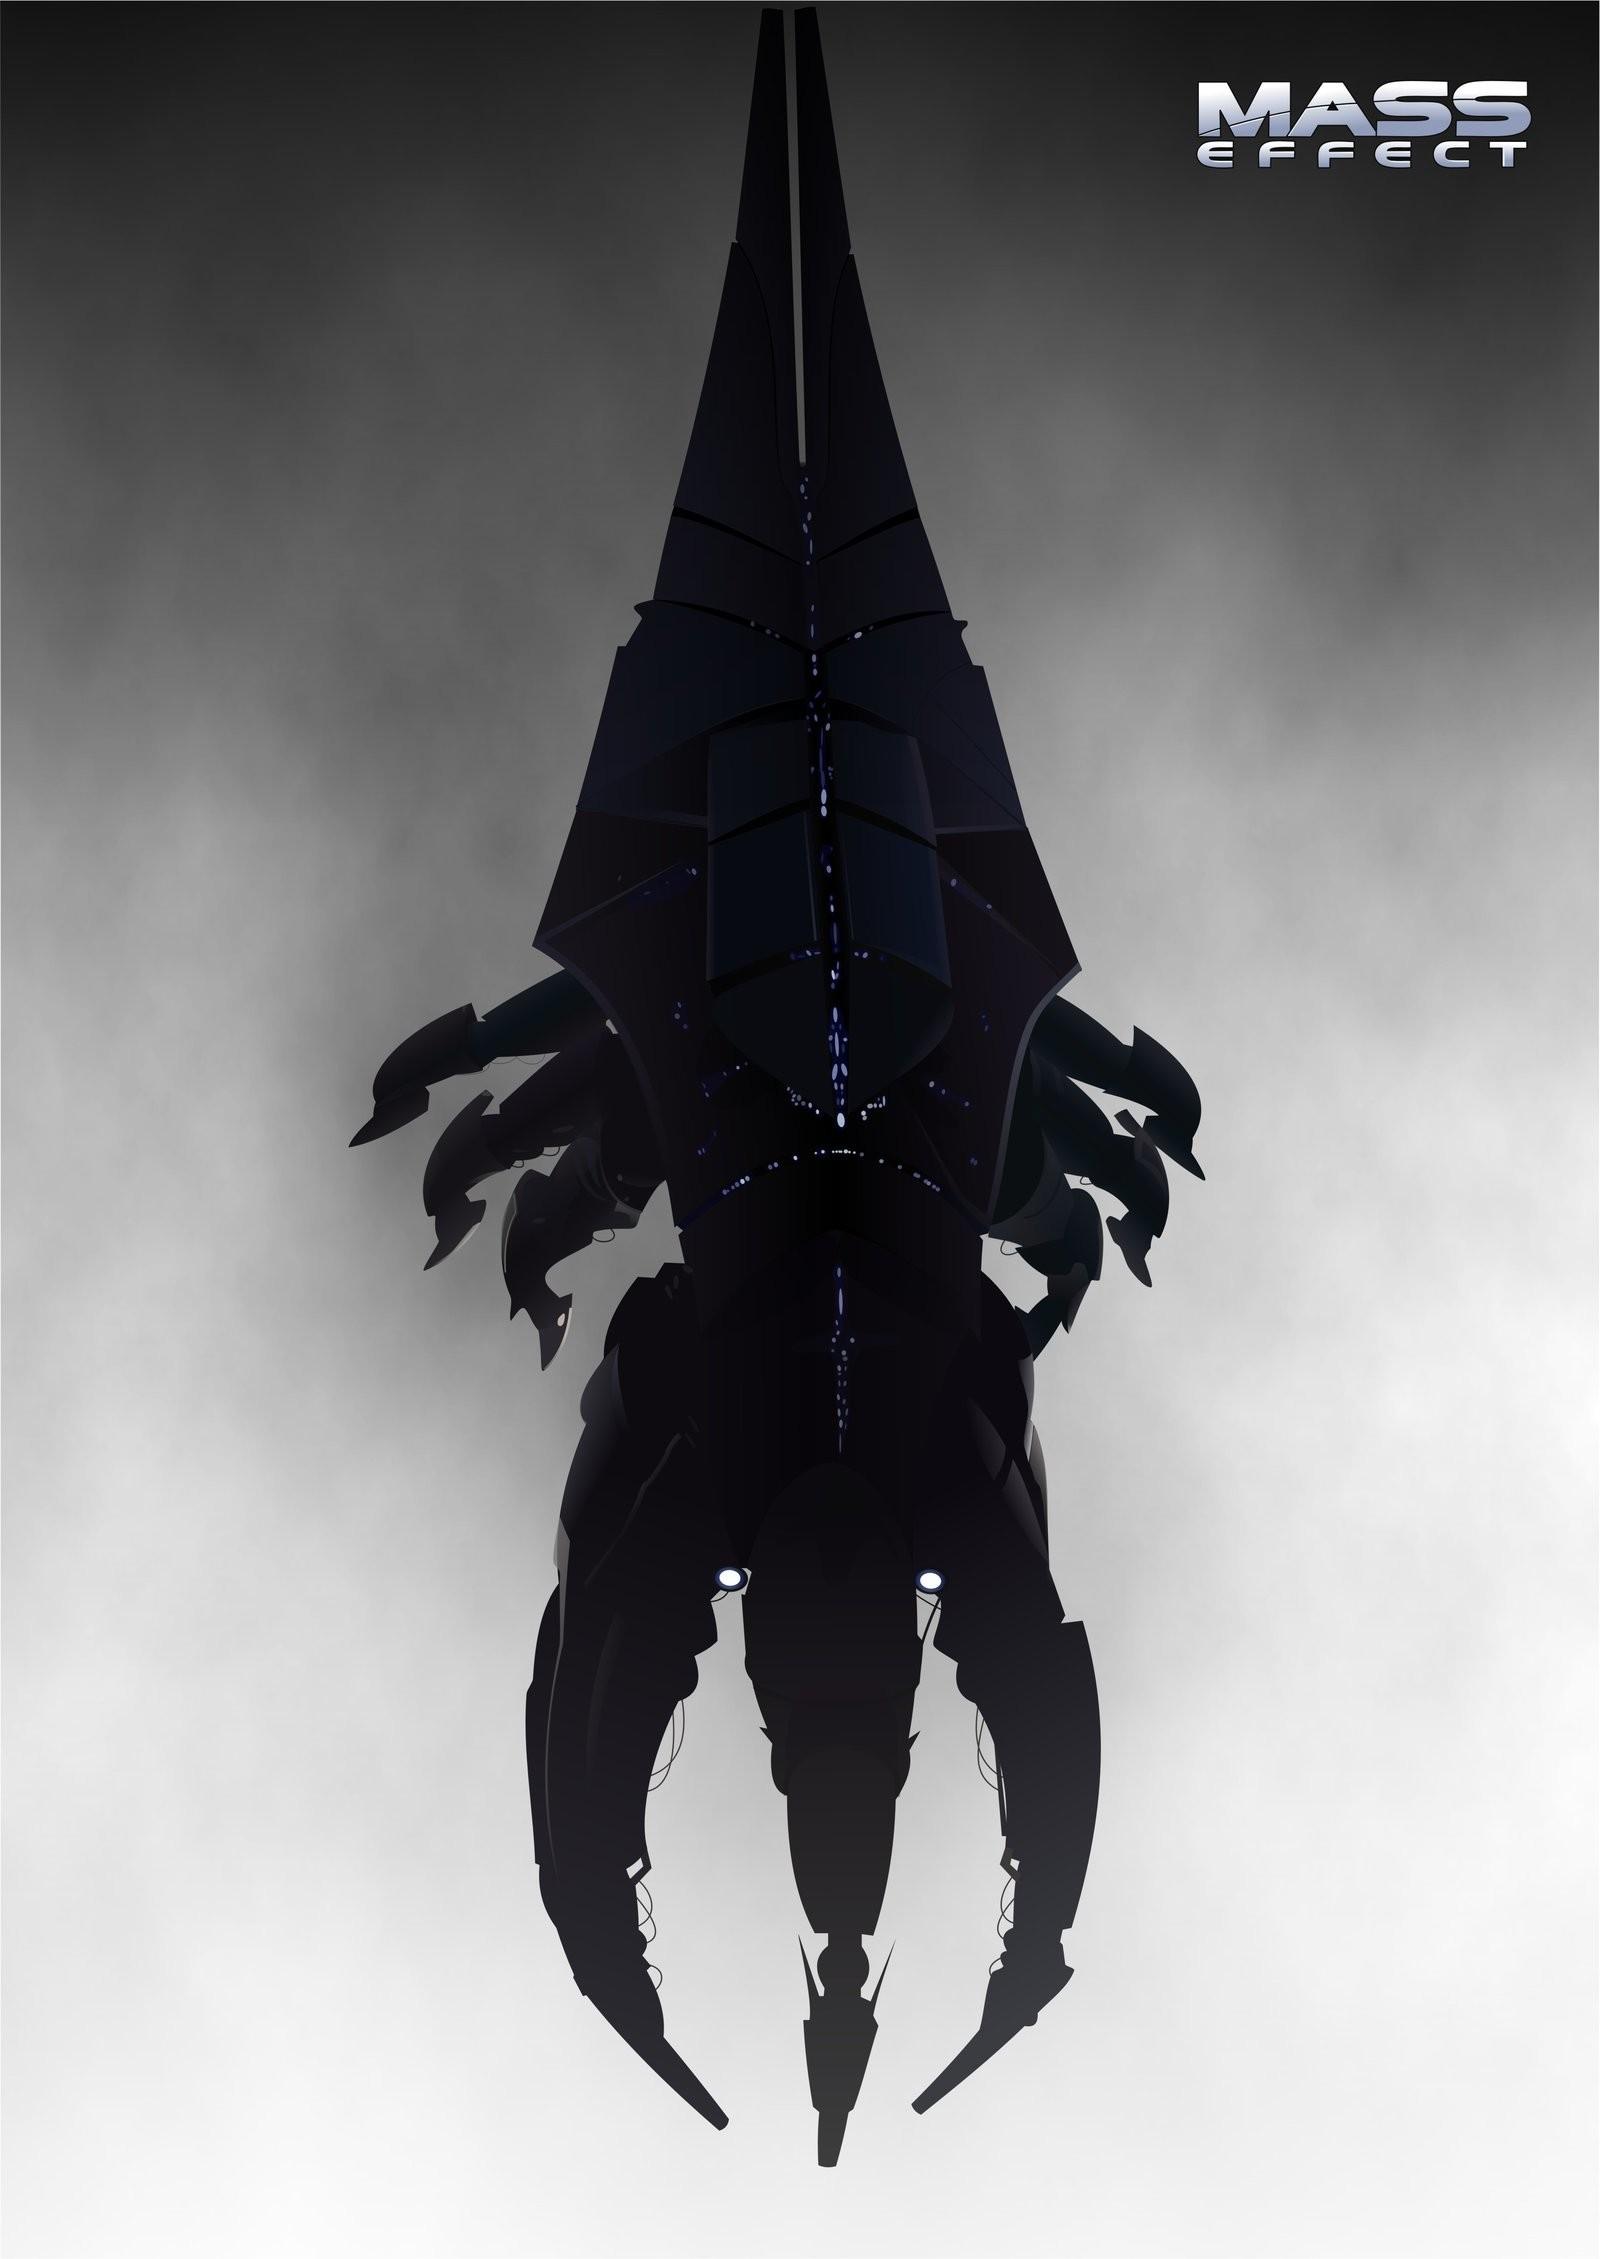 Mass Effect – Reaper by KISbubi Mass Effect – Reaper by KISbubi